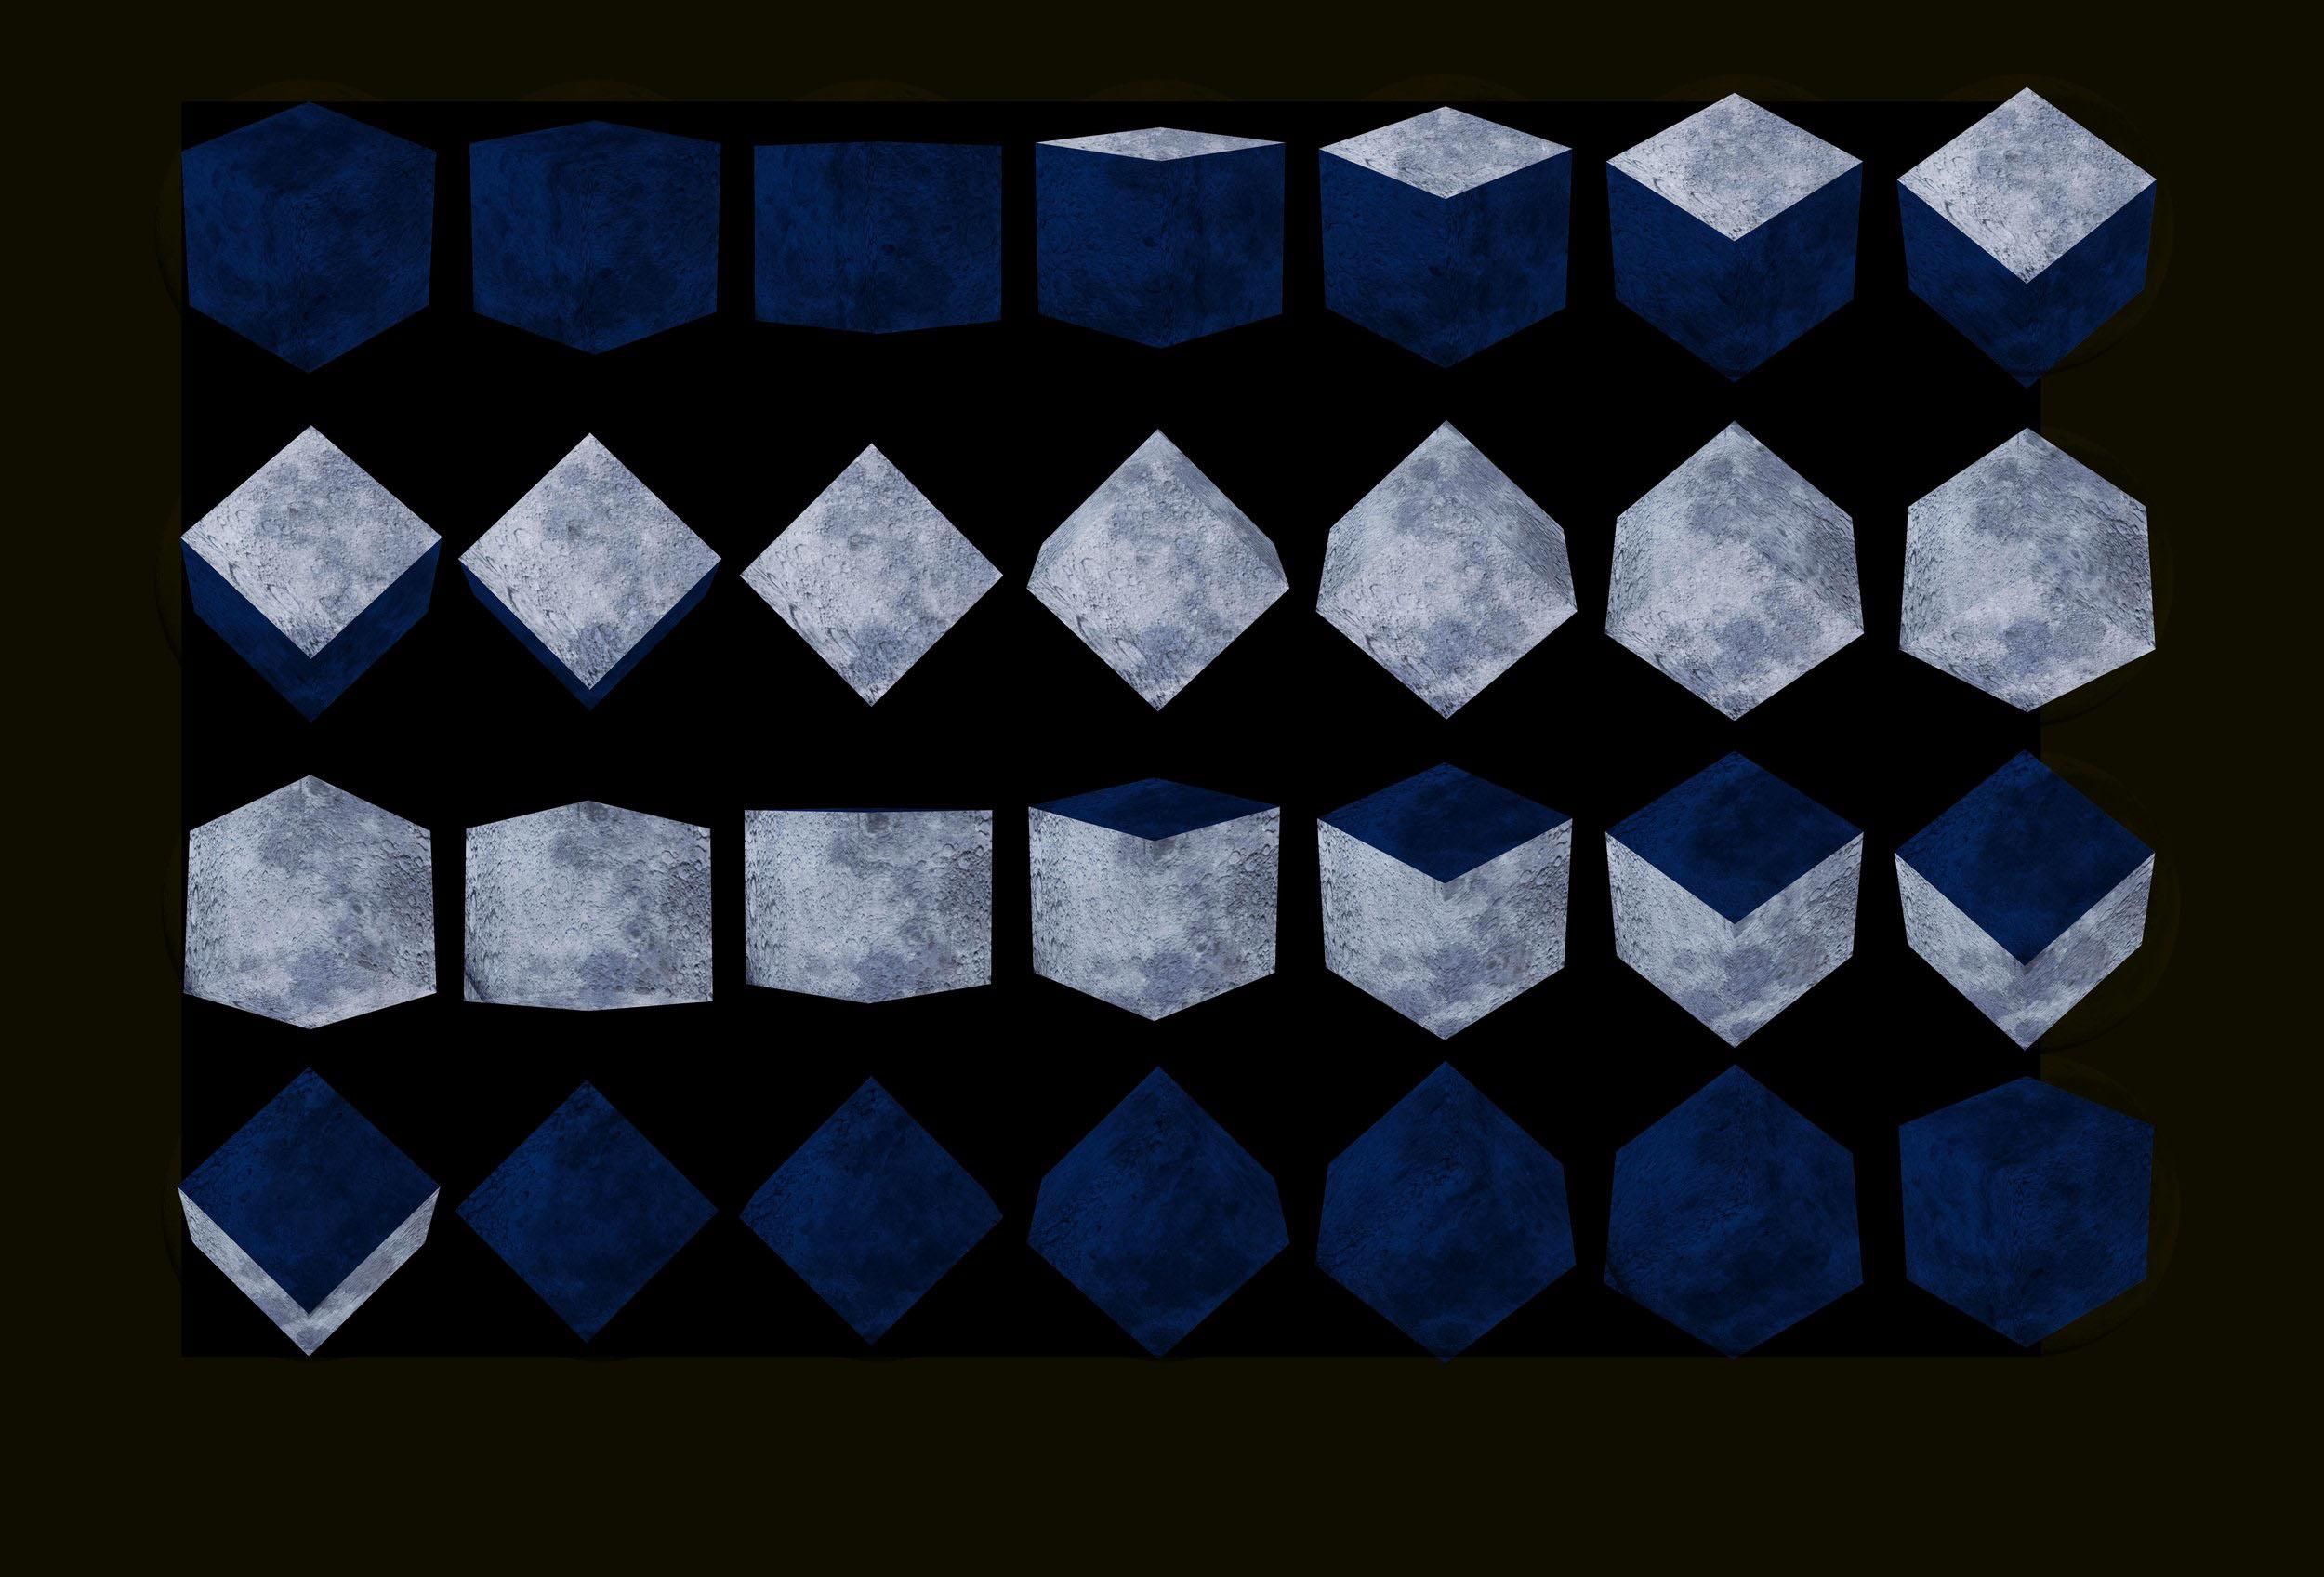 wassaic-project-artist-daniel-zeese-cube-moon-2018-06-04-11-12-53.jpg